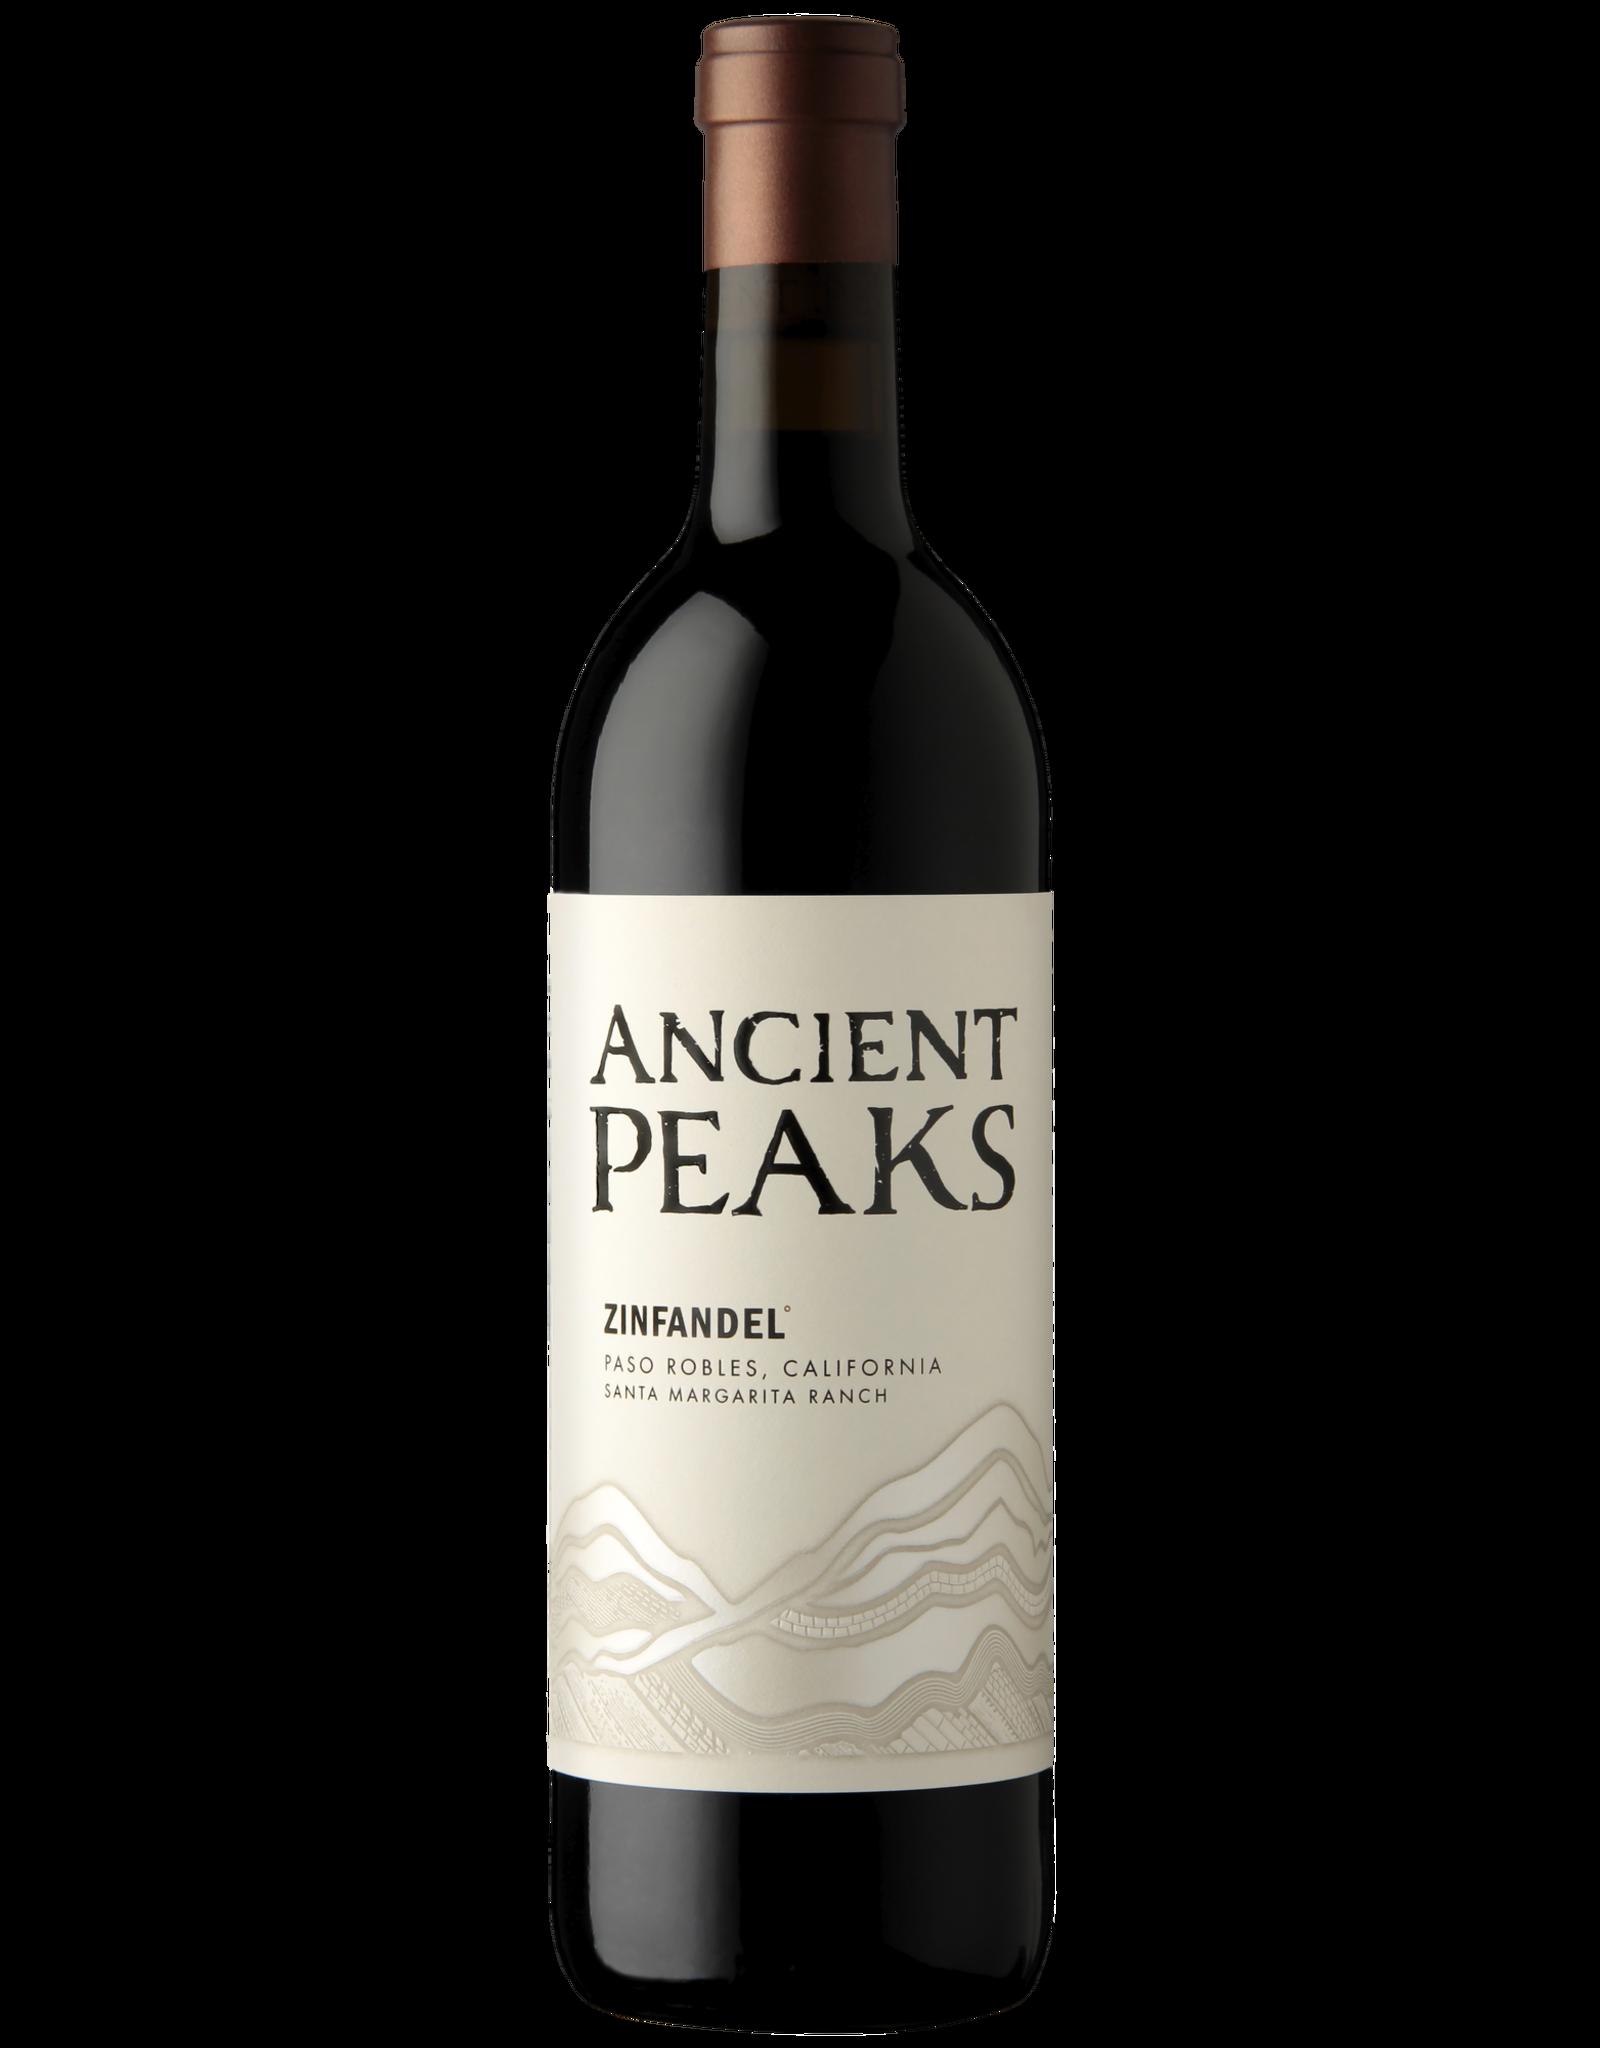 Ancient Peaks Zinfandel 2018